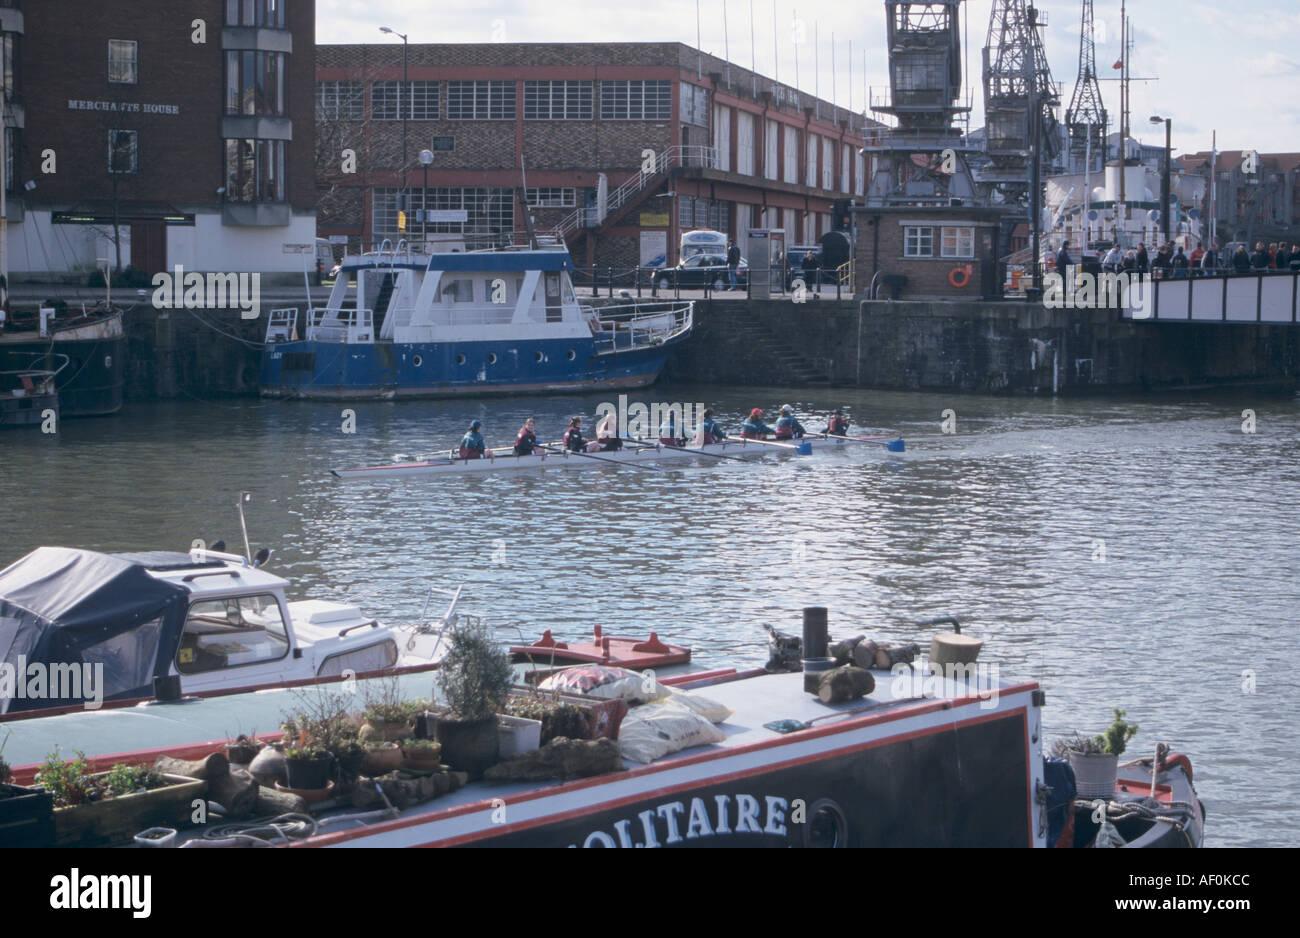 Rowing team on the river Avon Bristol - Stock Image